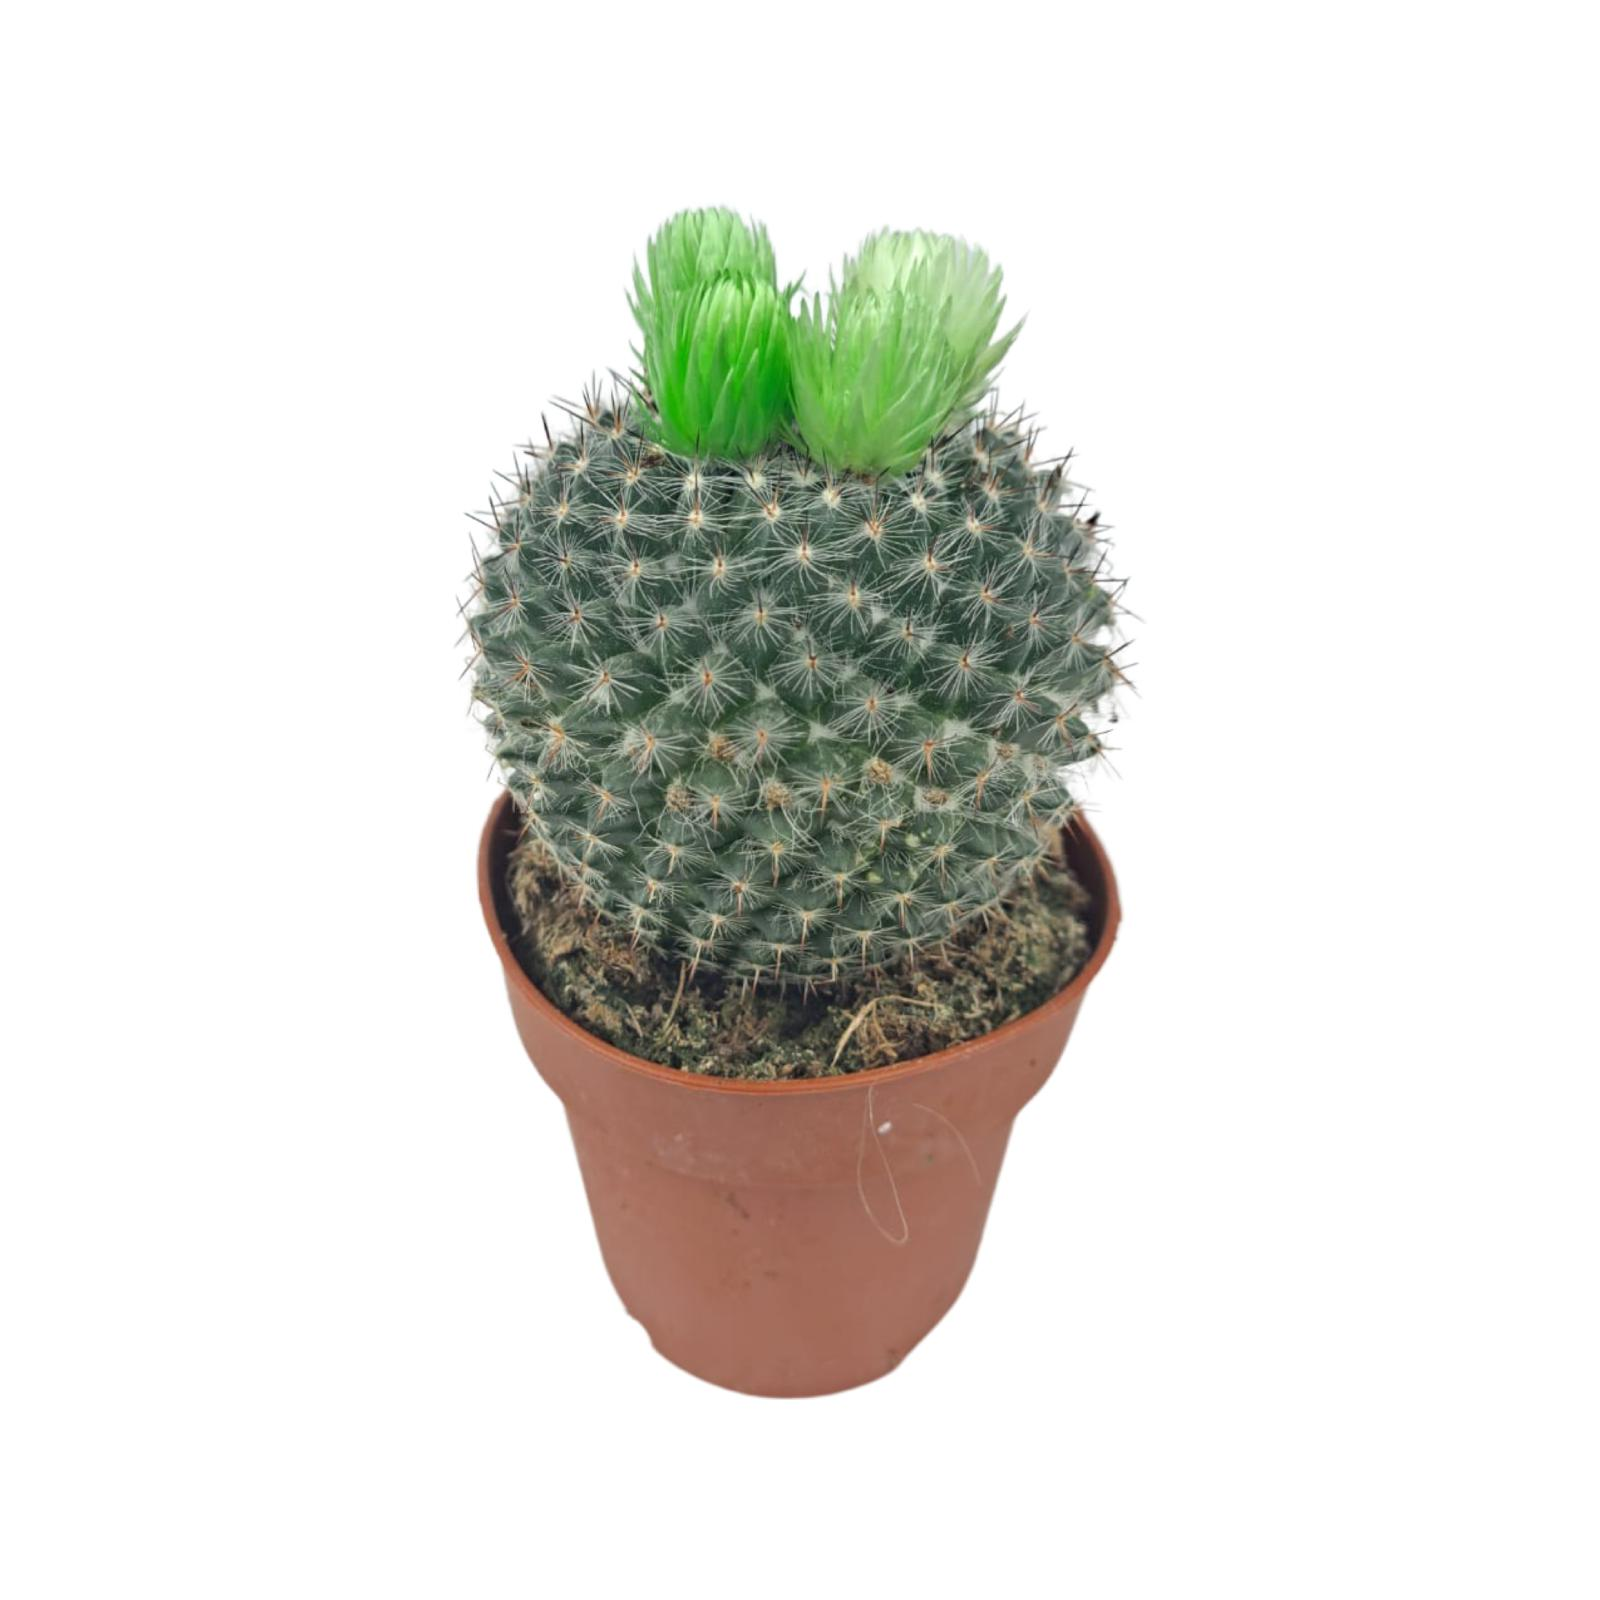 Cactus Green Balls Wholesale Plants